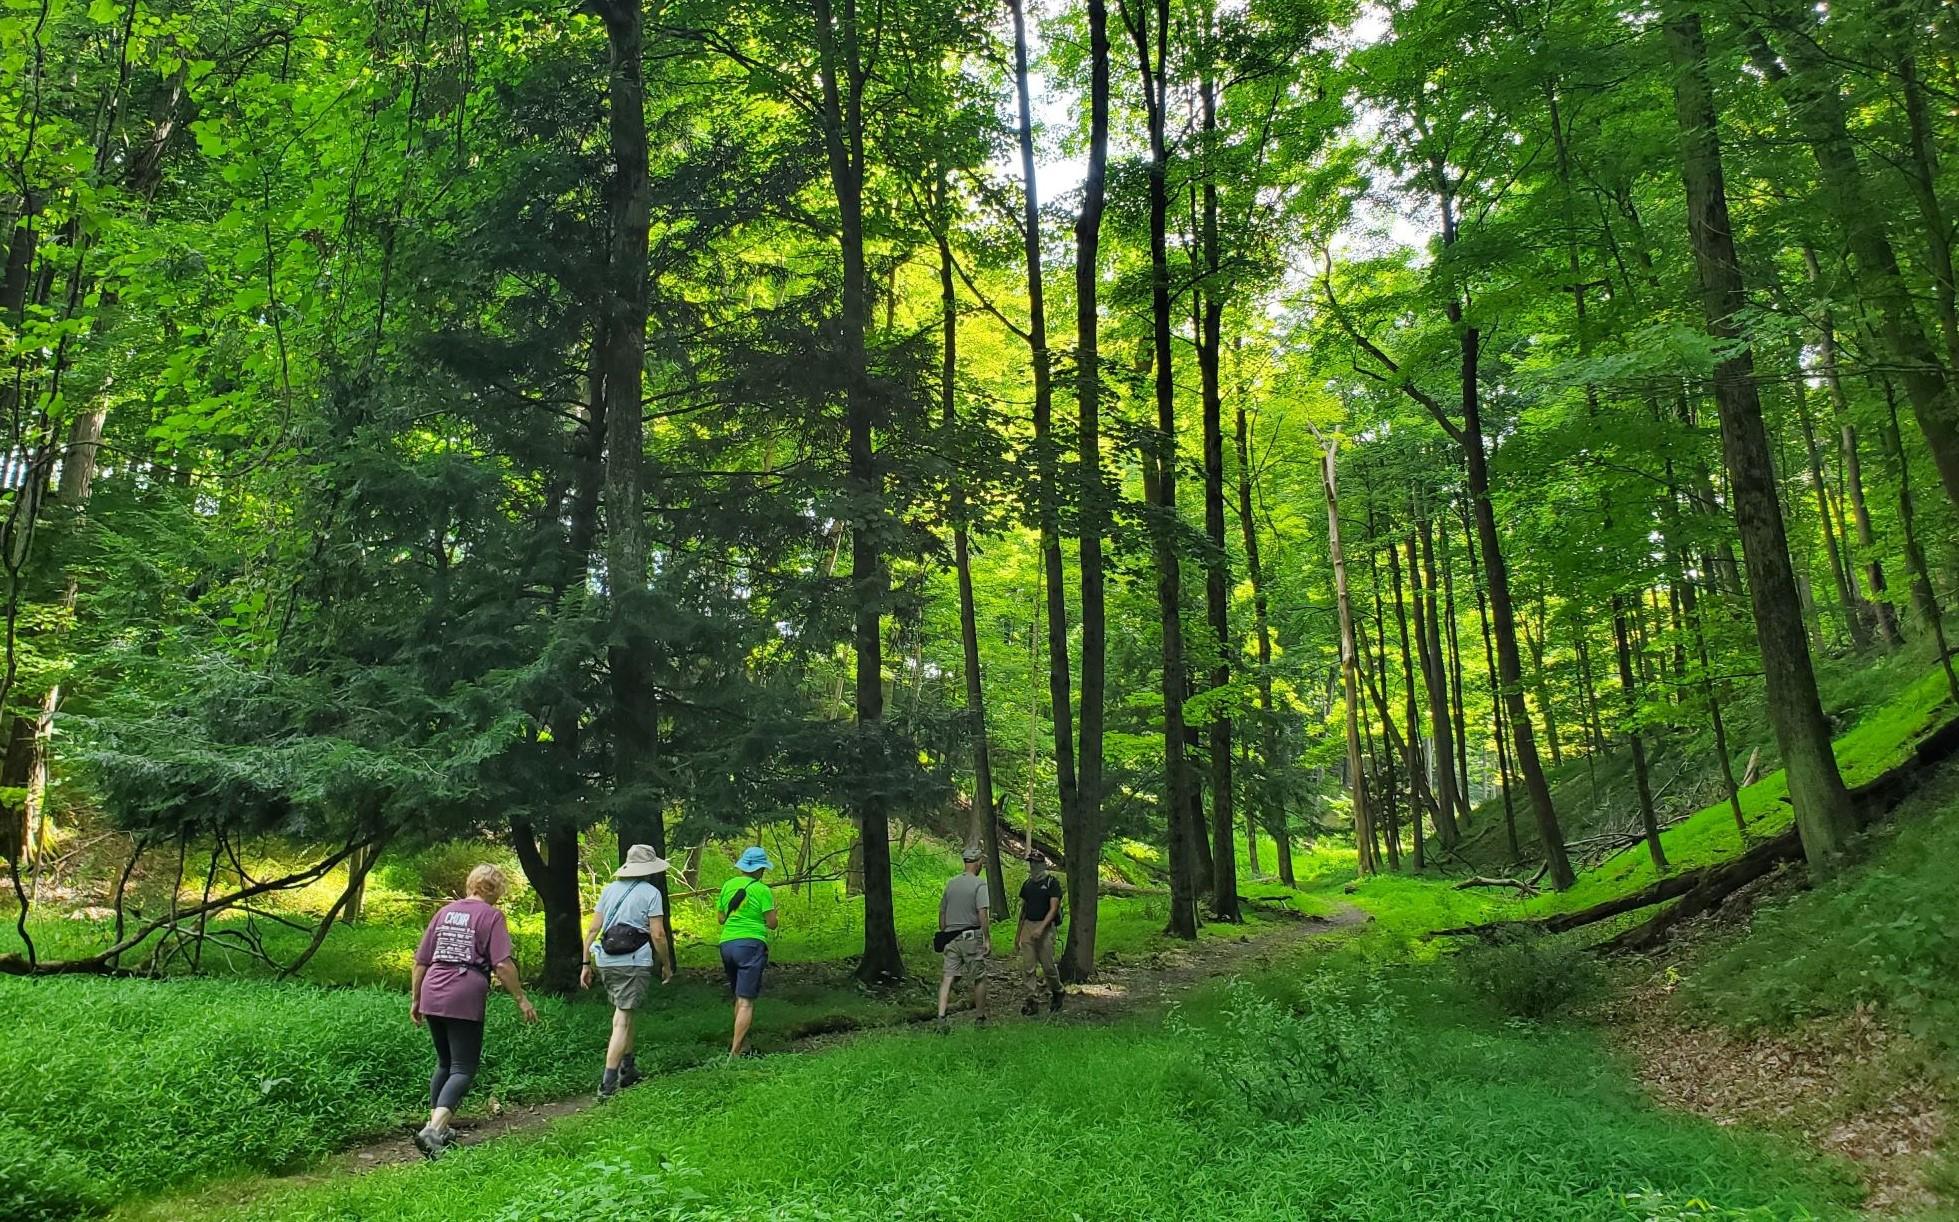 Oglebay Hikers 2 Resized Cropped 20200814_094210[1]